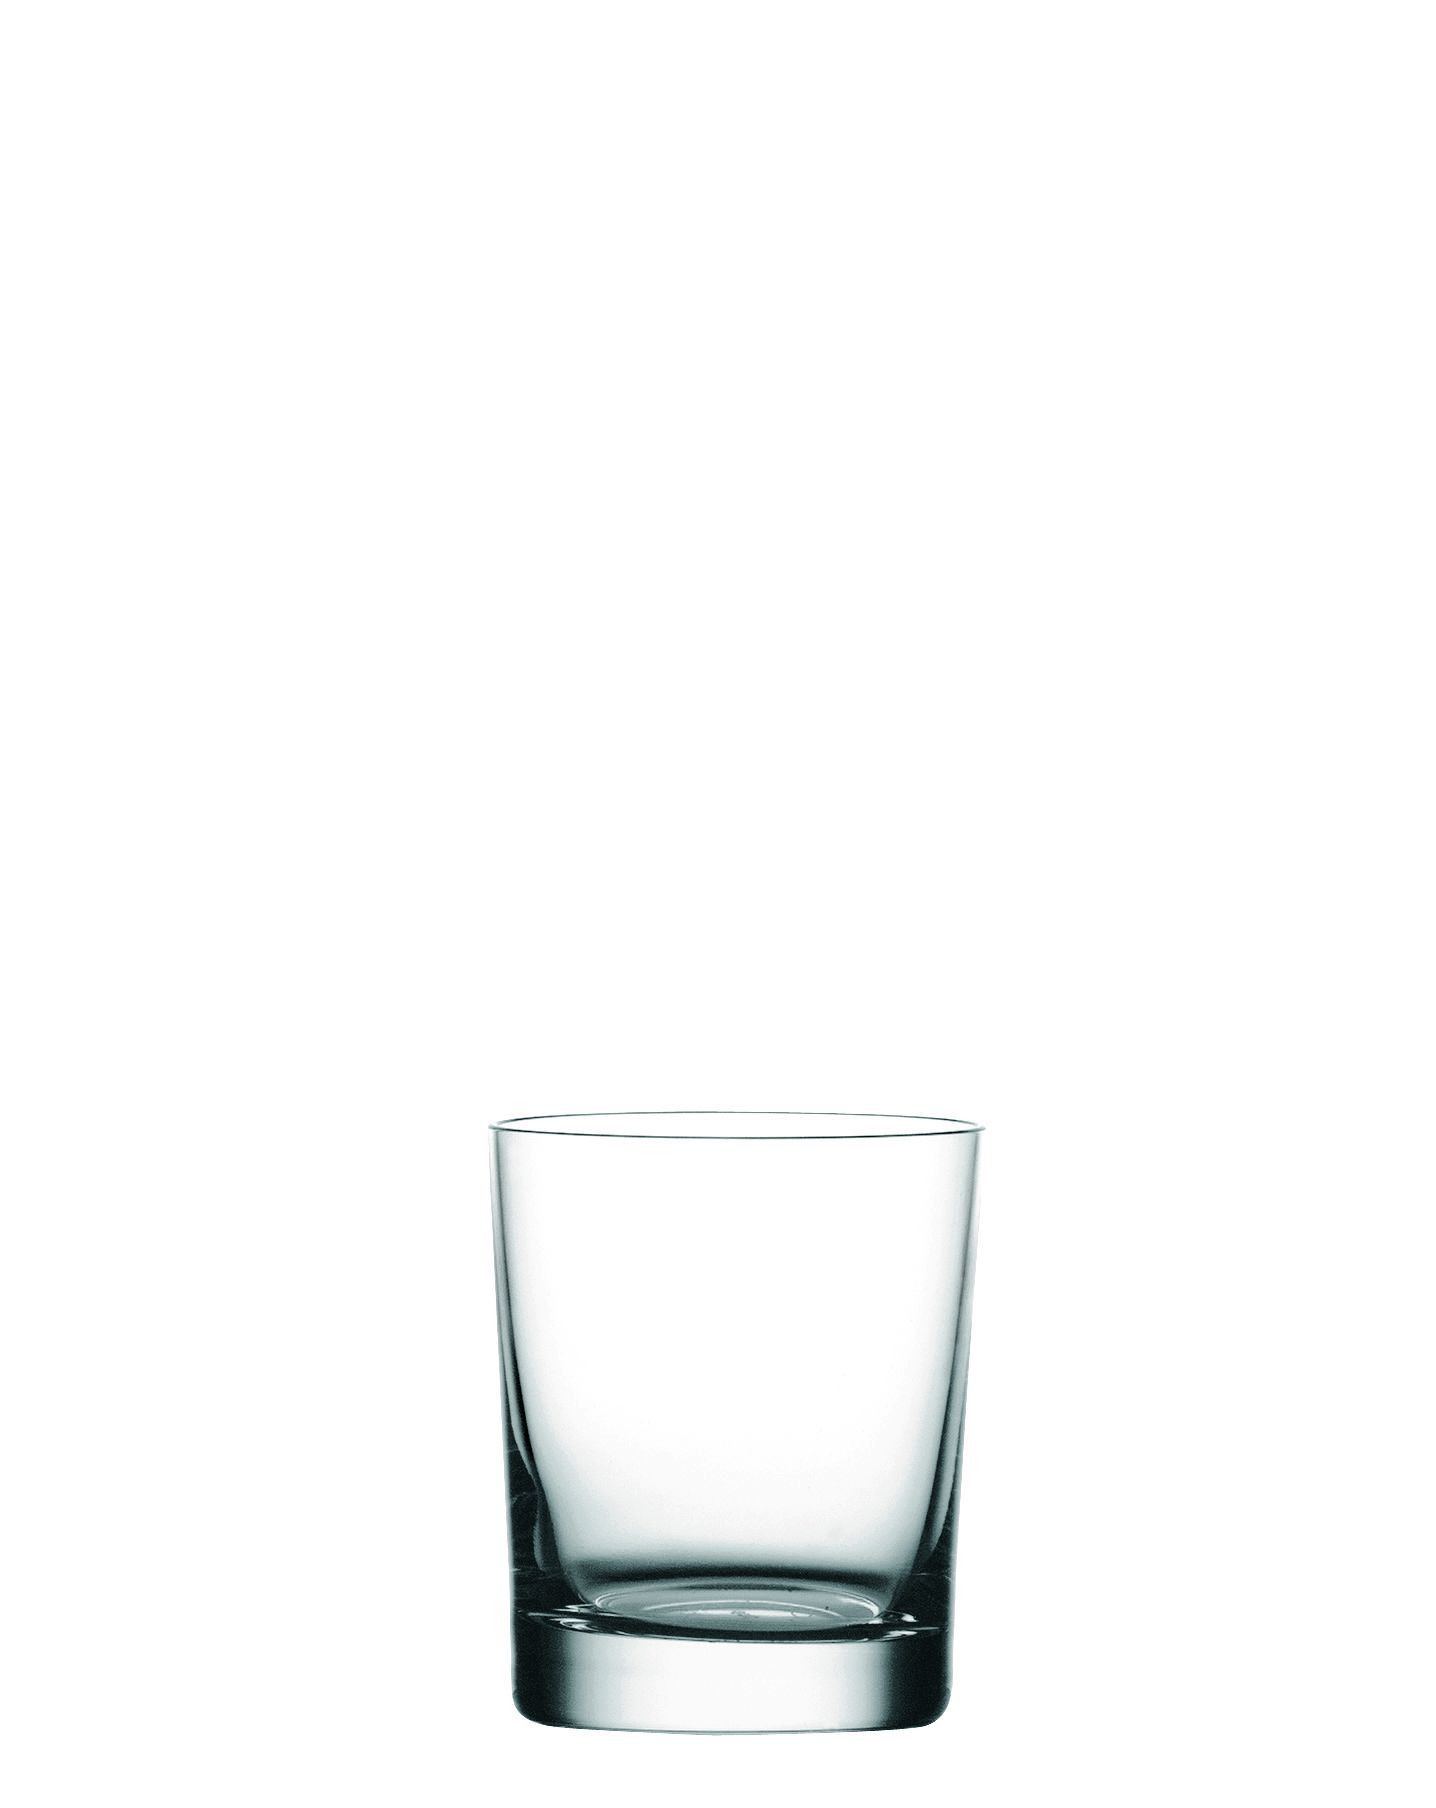 Стаканы Стакан для виски 280мл Nachtmann Classic Whisky Tumbler stakan-dlya-viski-280ml-nachtmann-classic-whisky-tumbler-germaniya.jpg